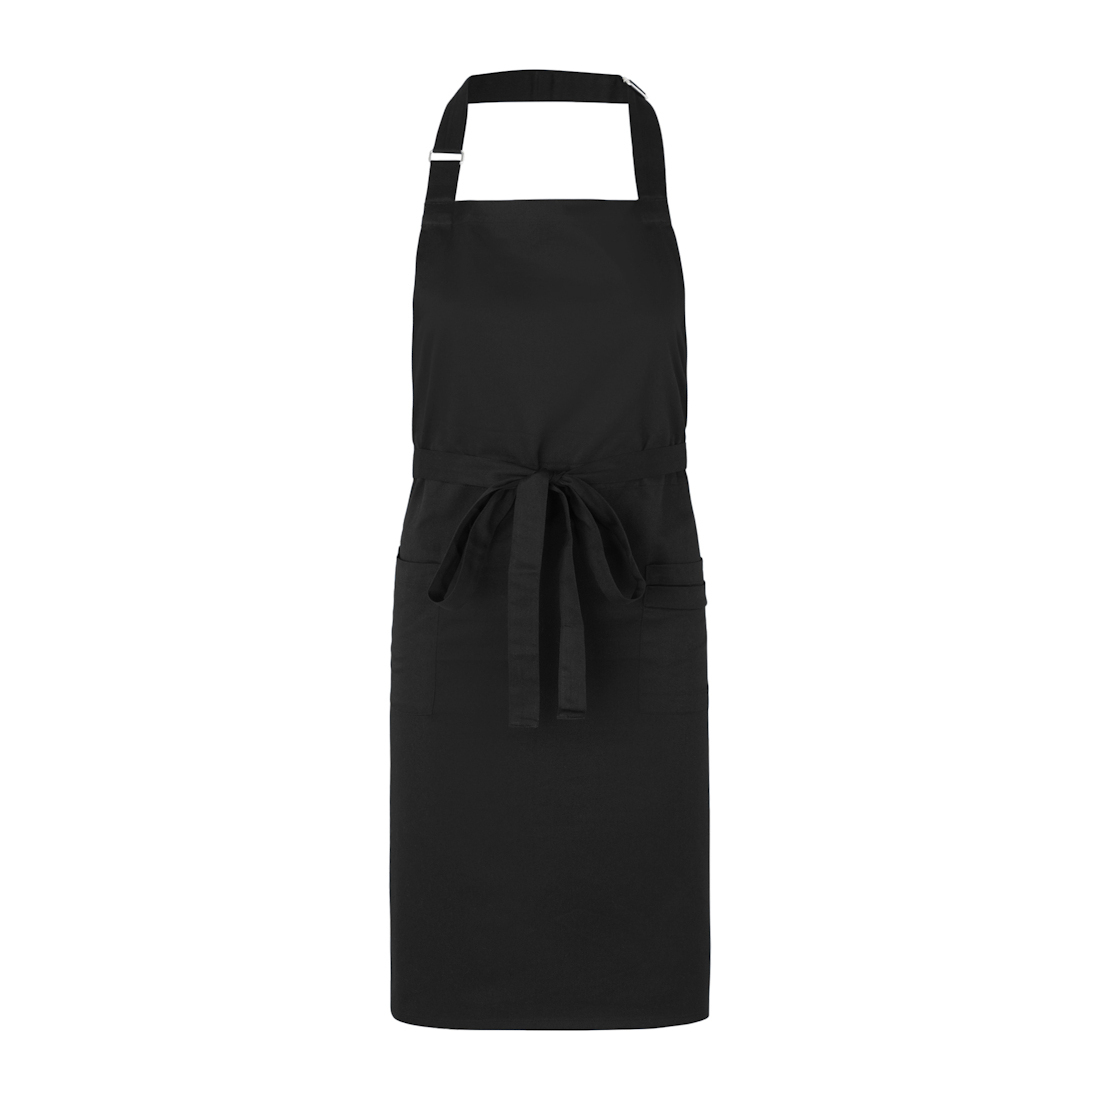 Neutral Waiters Apron O92020 2